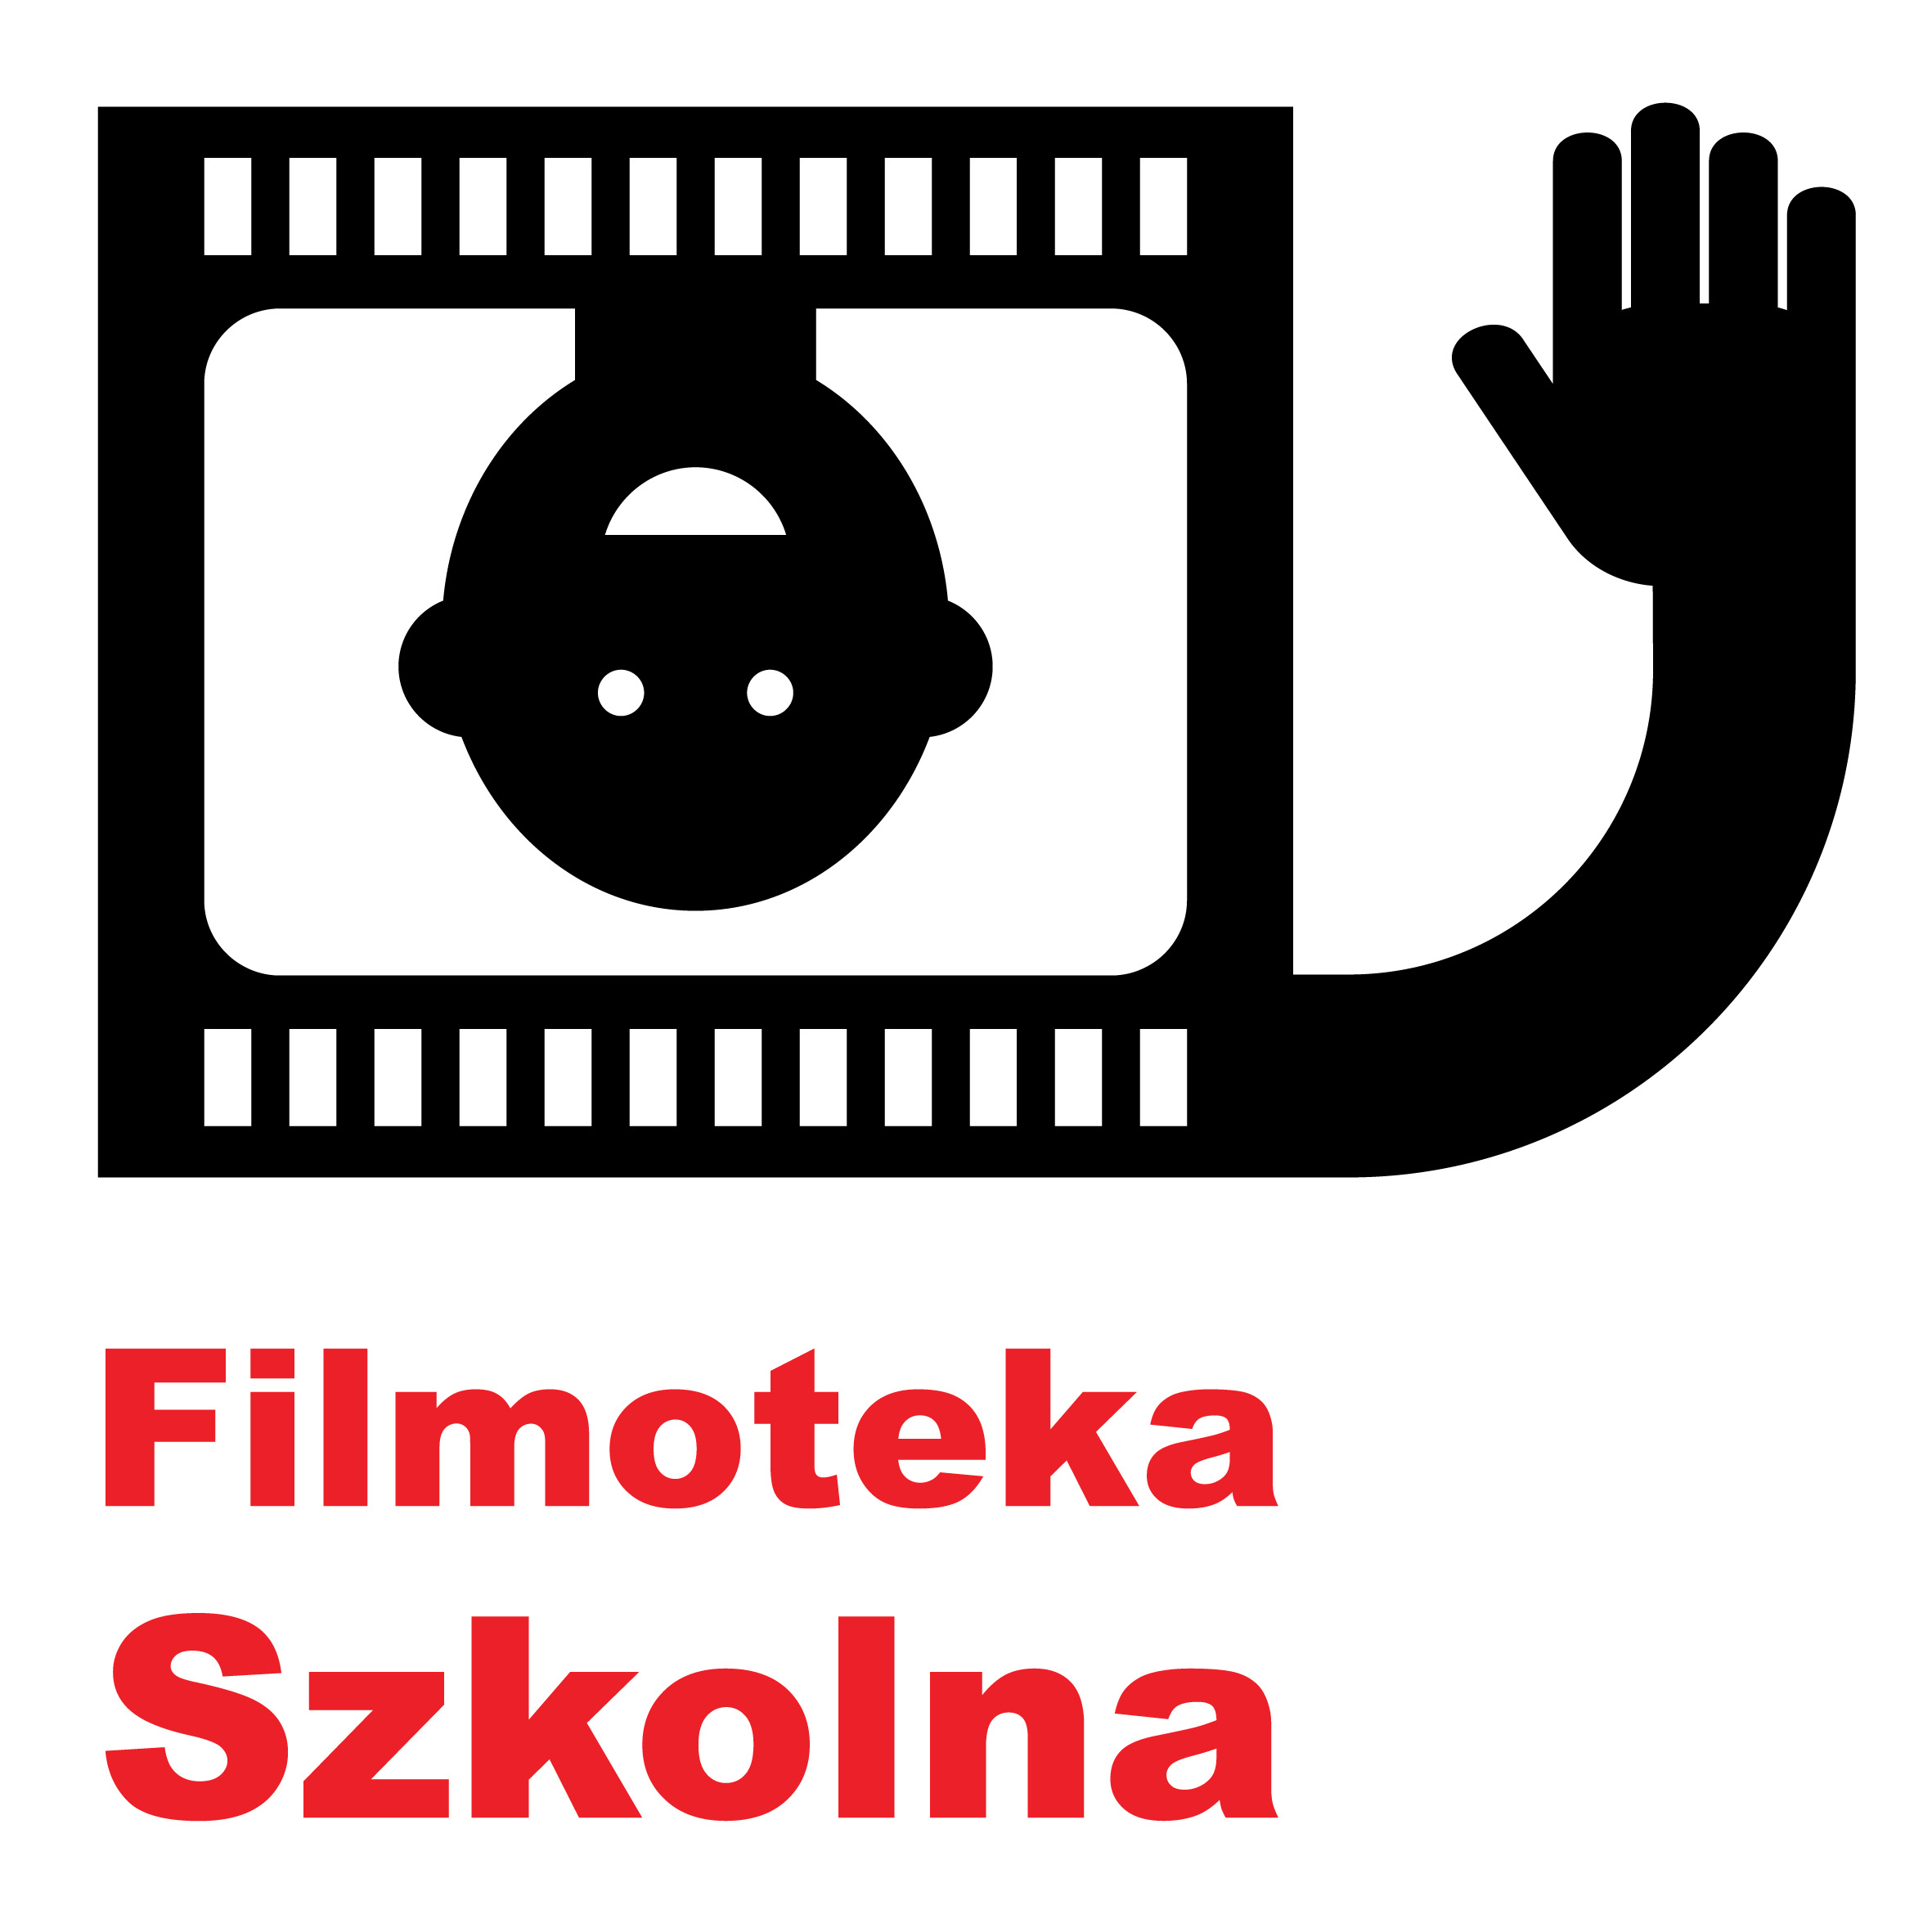 logo filmoteka szkolna pion